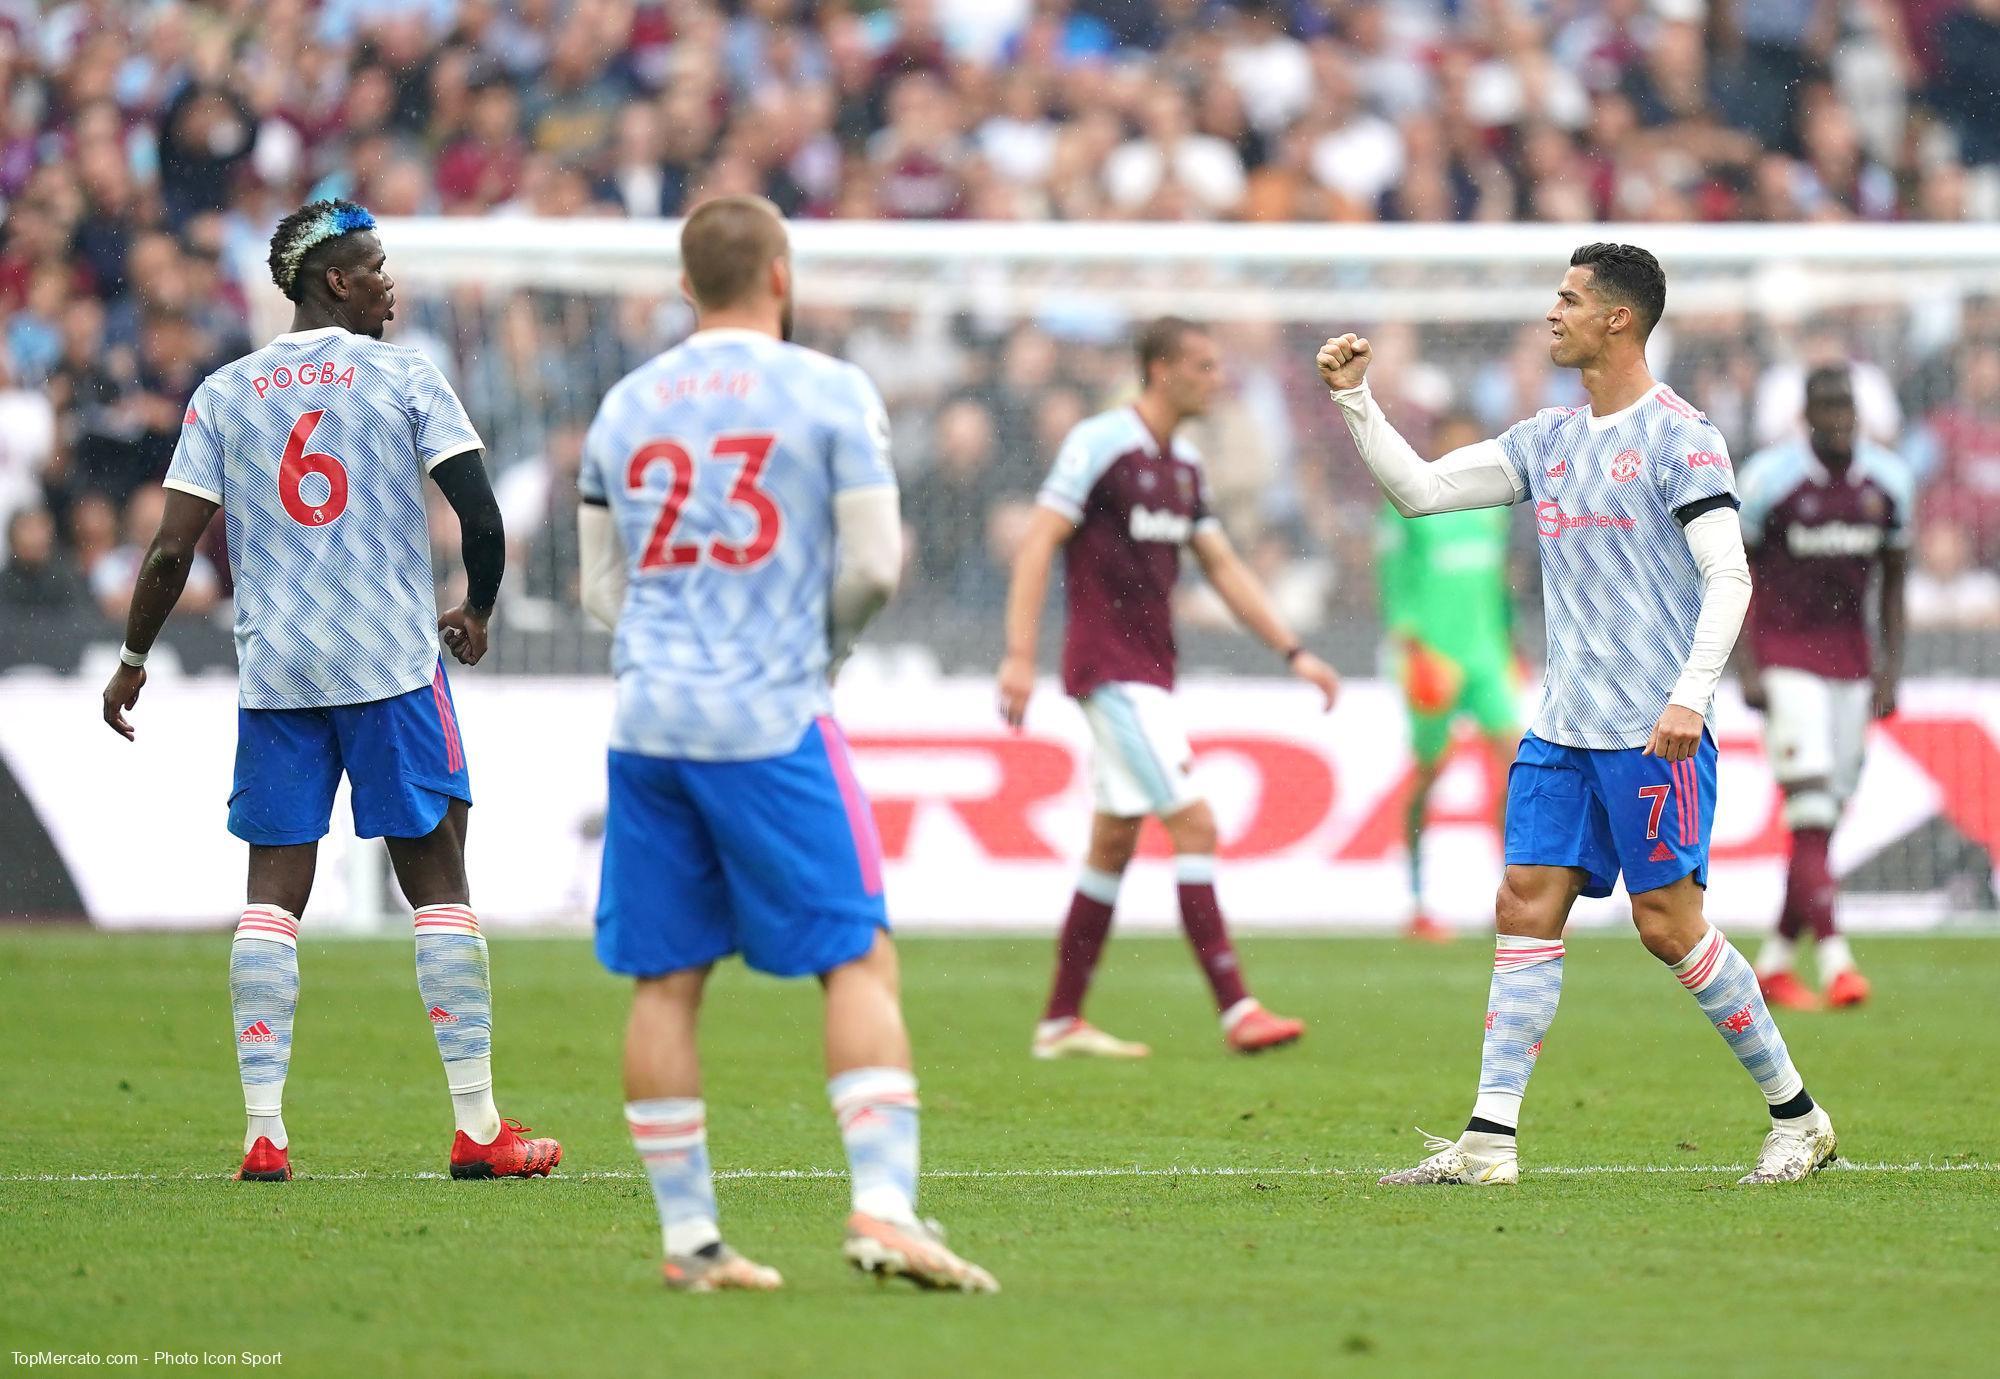 West Ham-Manchester United